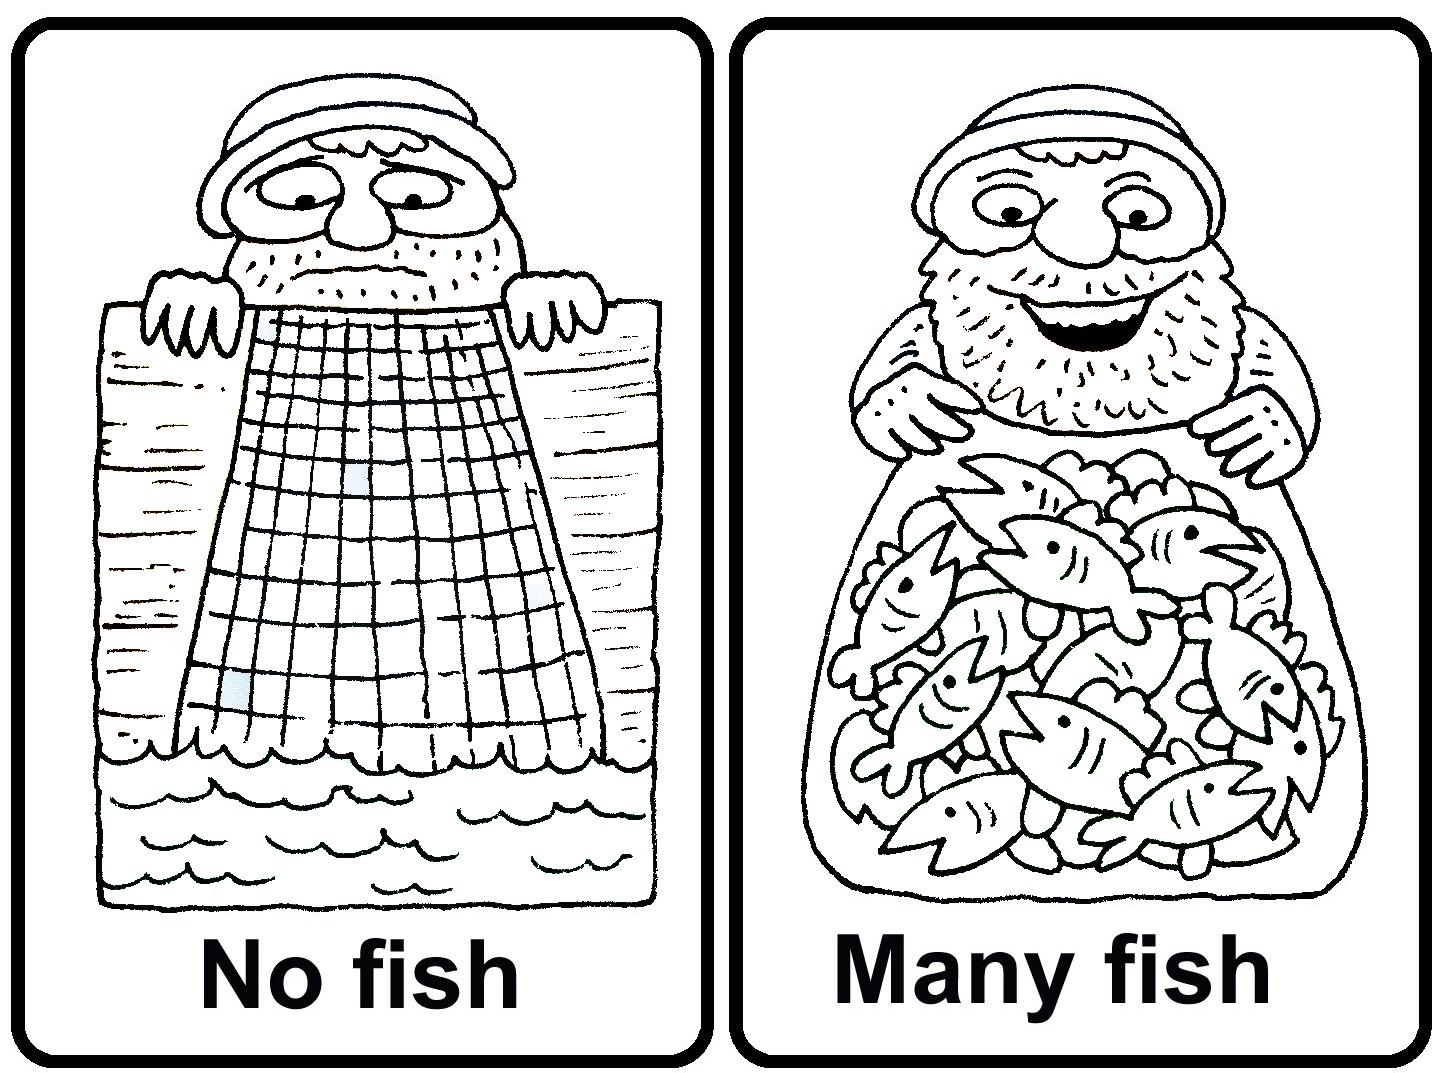 Fish Net clipart empty Sliding Full Lambsongs fishes Black